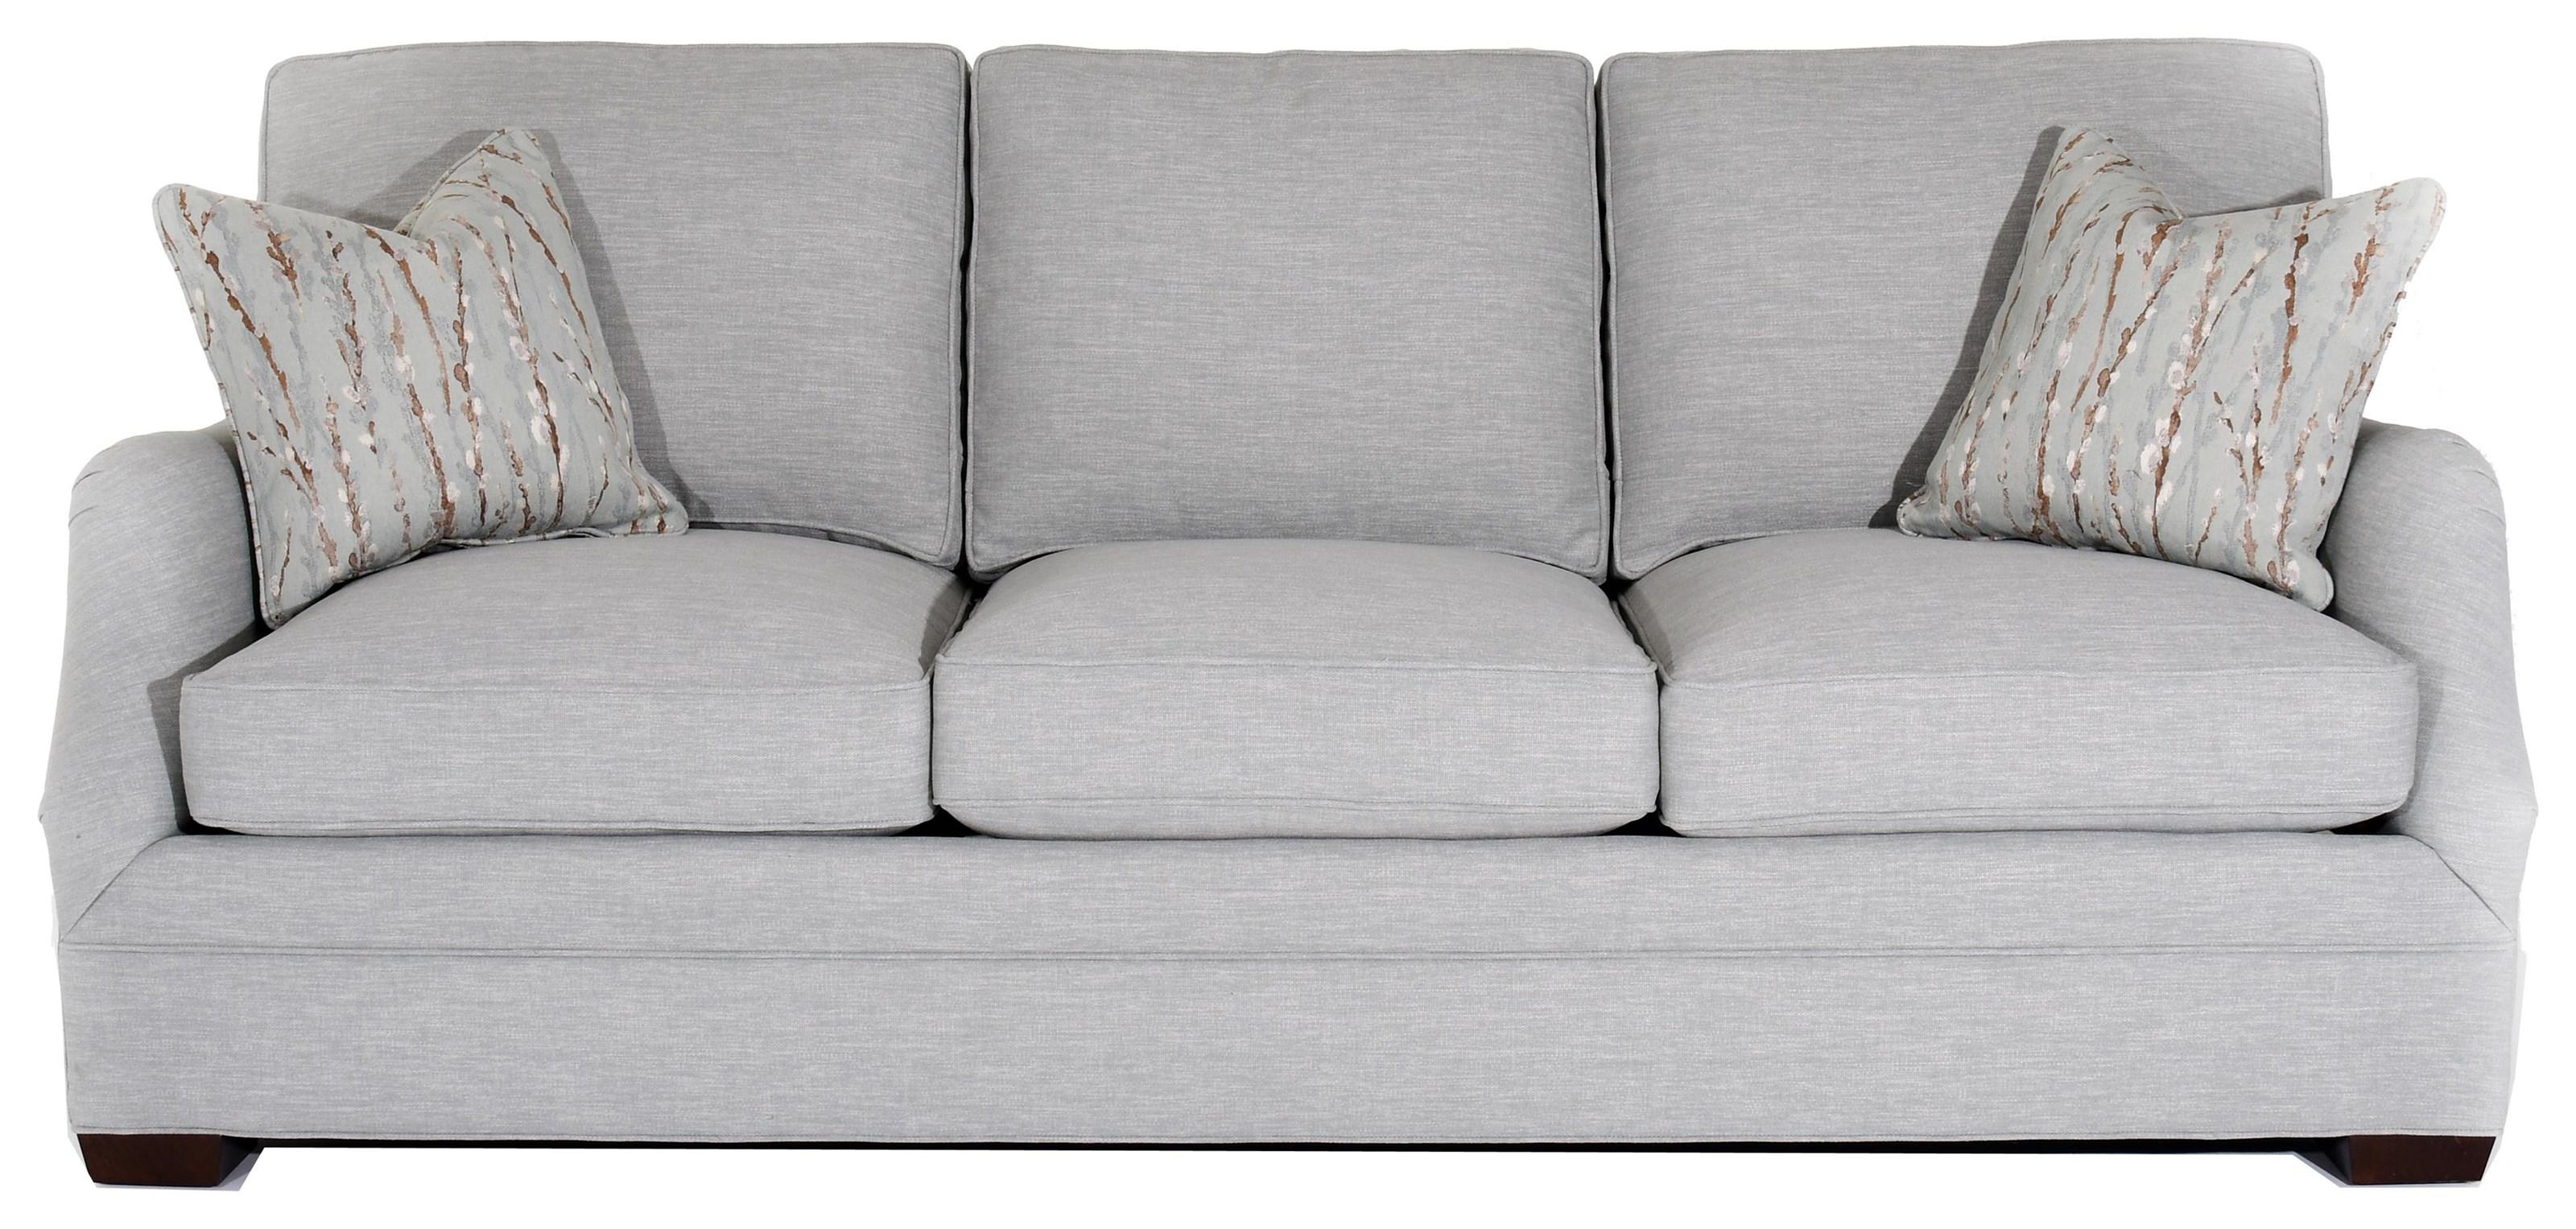 Customizable Three Cushion Sofa